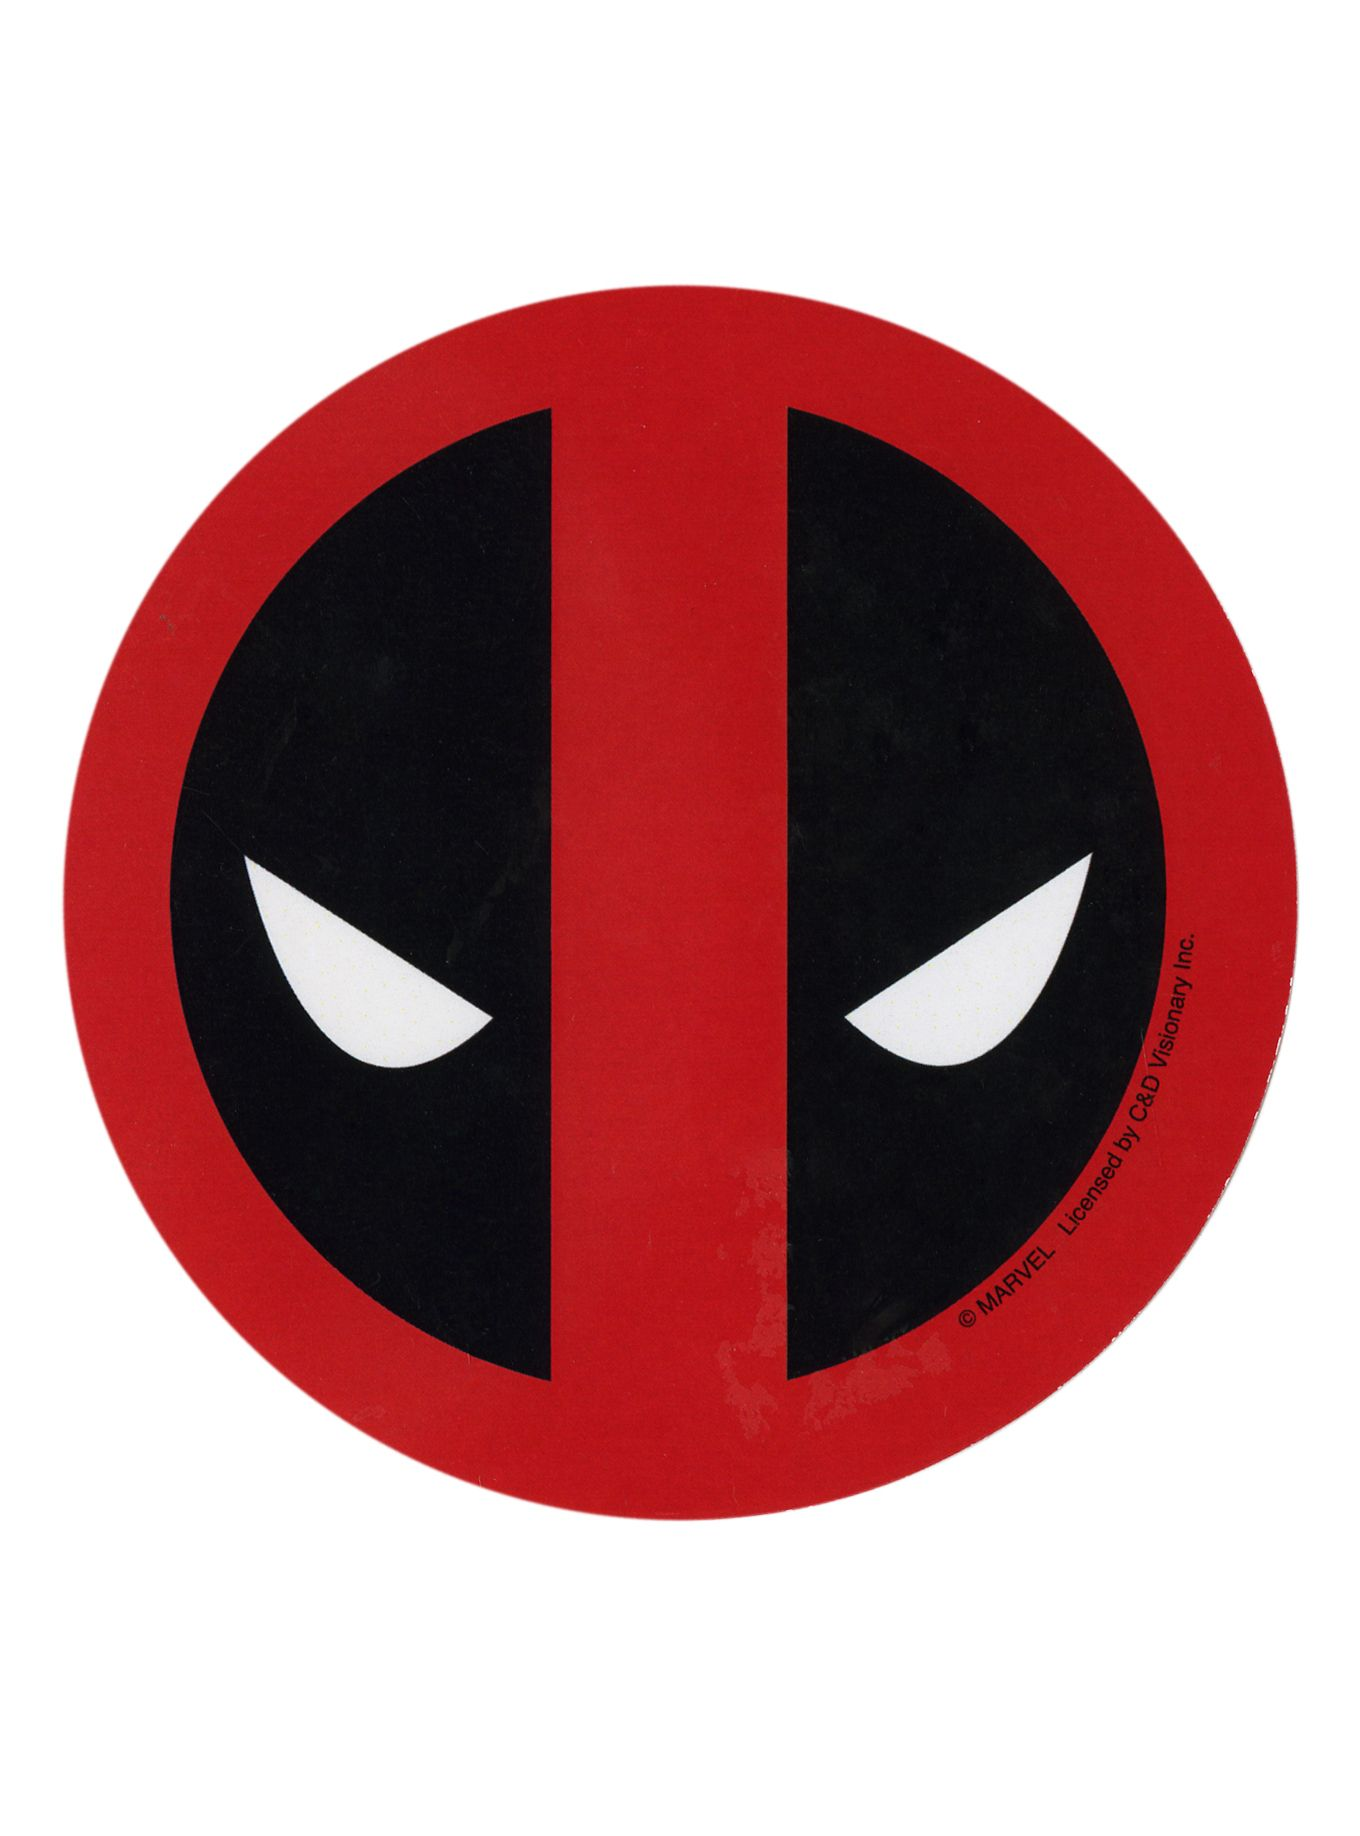 Die Cut Sticker Of The Deadpool Mask Logo Superheroes Pinterest